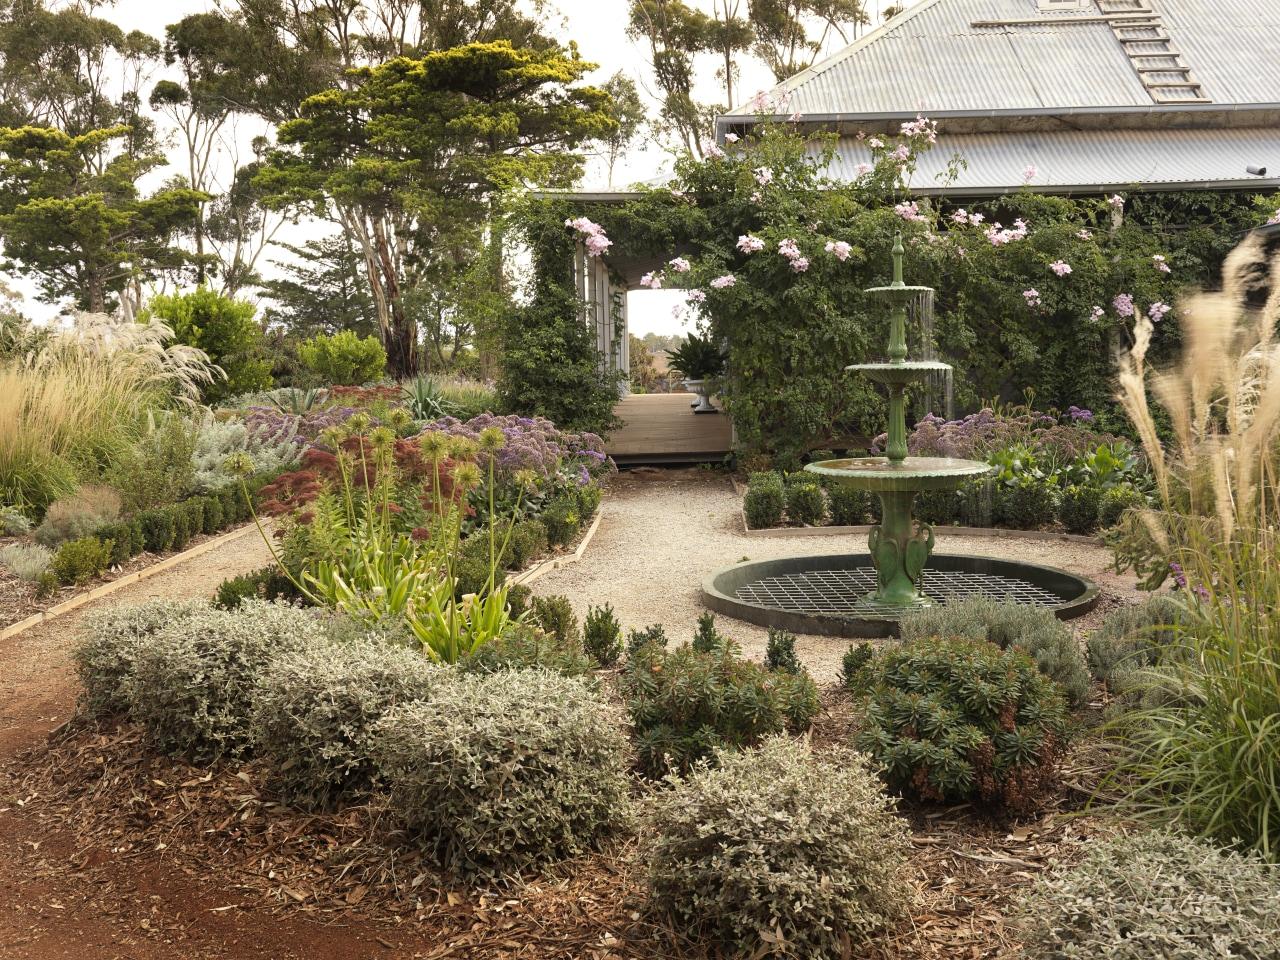 View of garden which features an antique fountain backyard, botanical garden, garden, grass, landscape, landscaping, outdoor structure, plant, tree, walkway, yard, brown